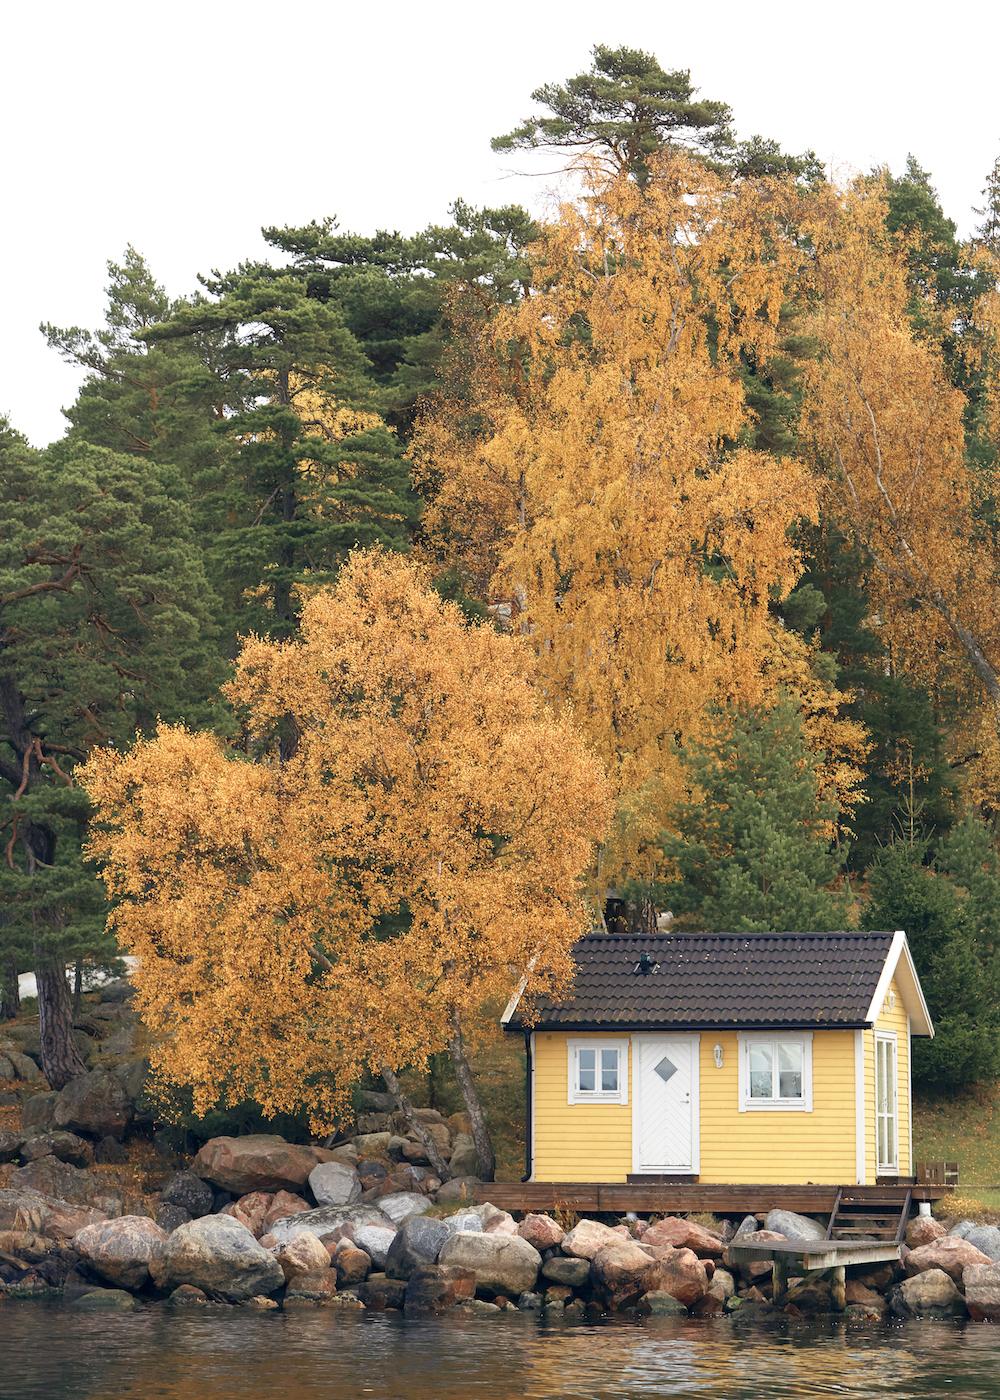 Tom Bunning - Stockholm archipelago